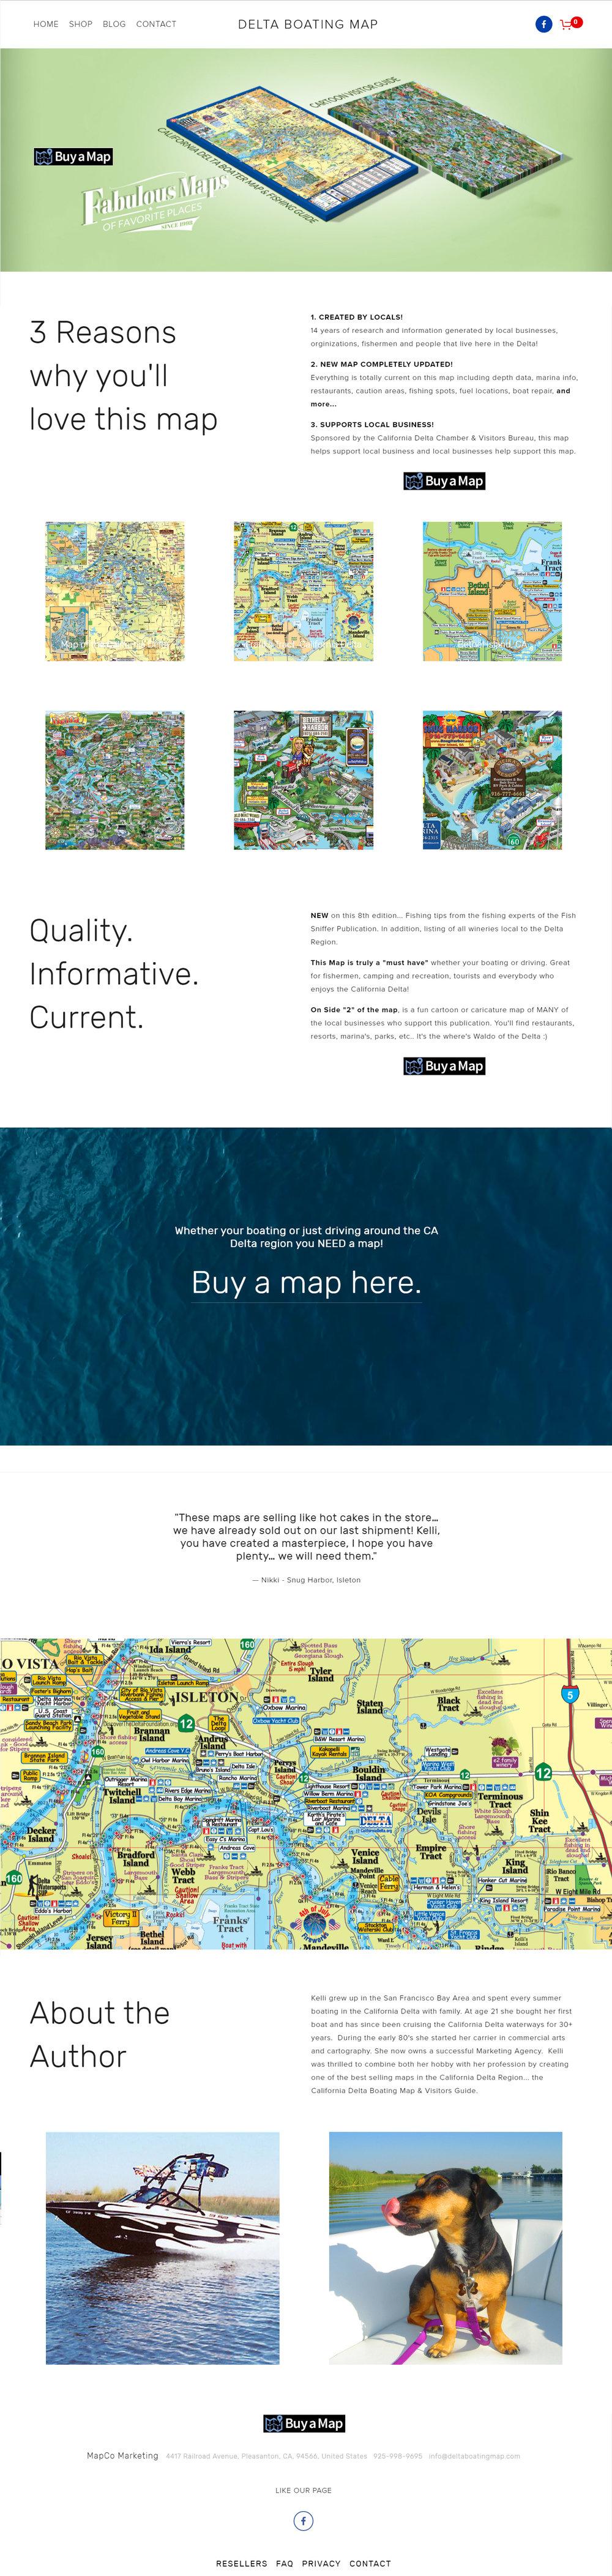 Delta Boating Map